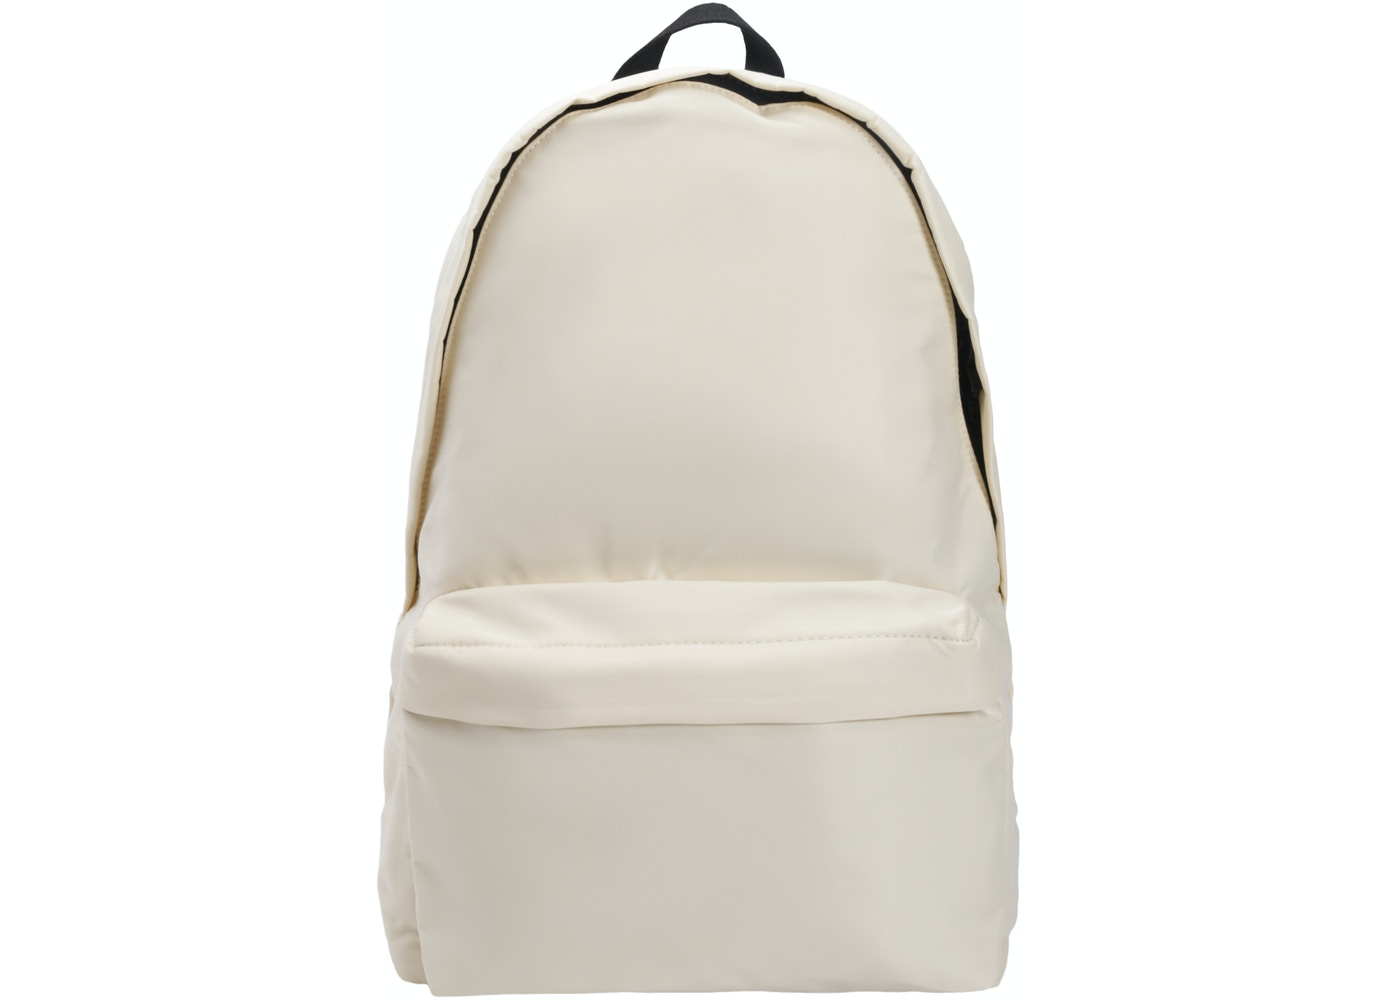 41fae69e95 FEAR OF GOD Essentials Graphic Backpack Cream - Essentials